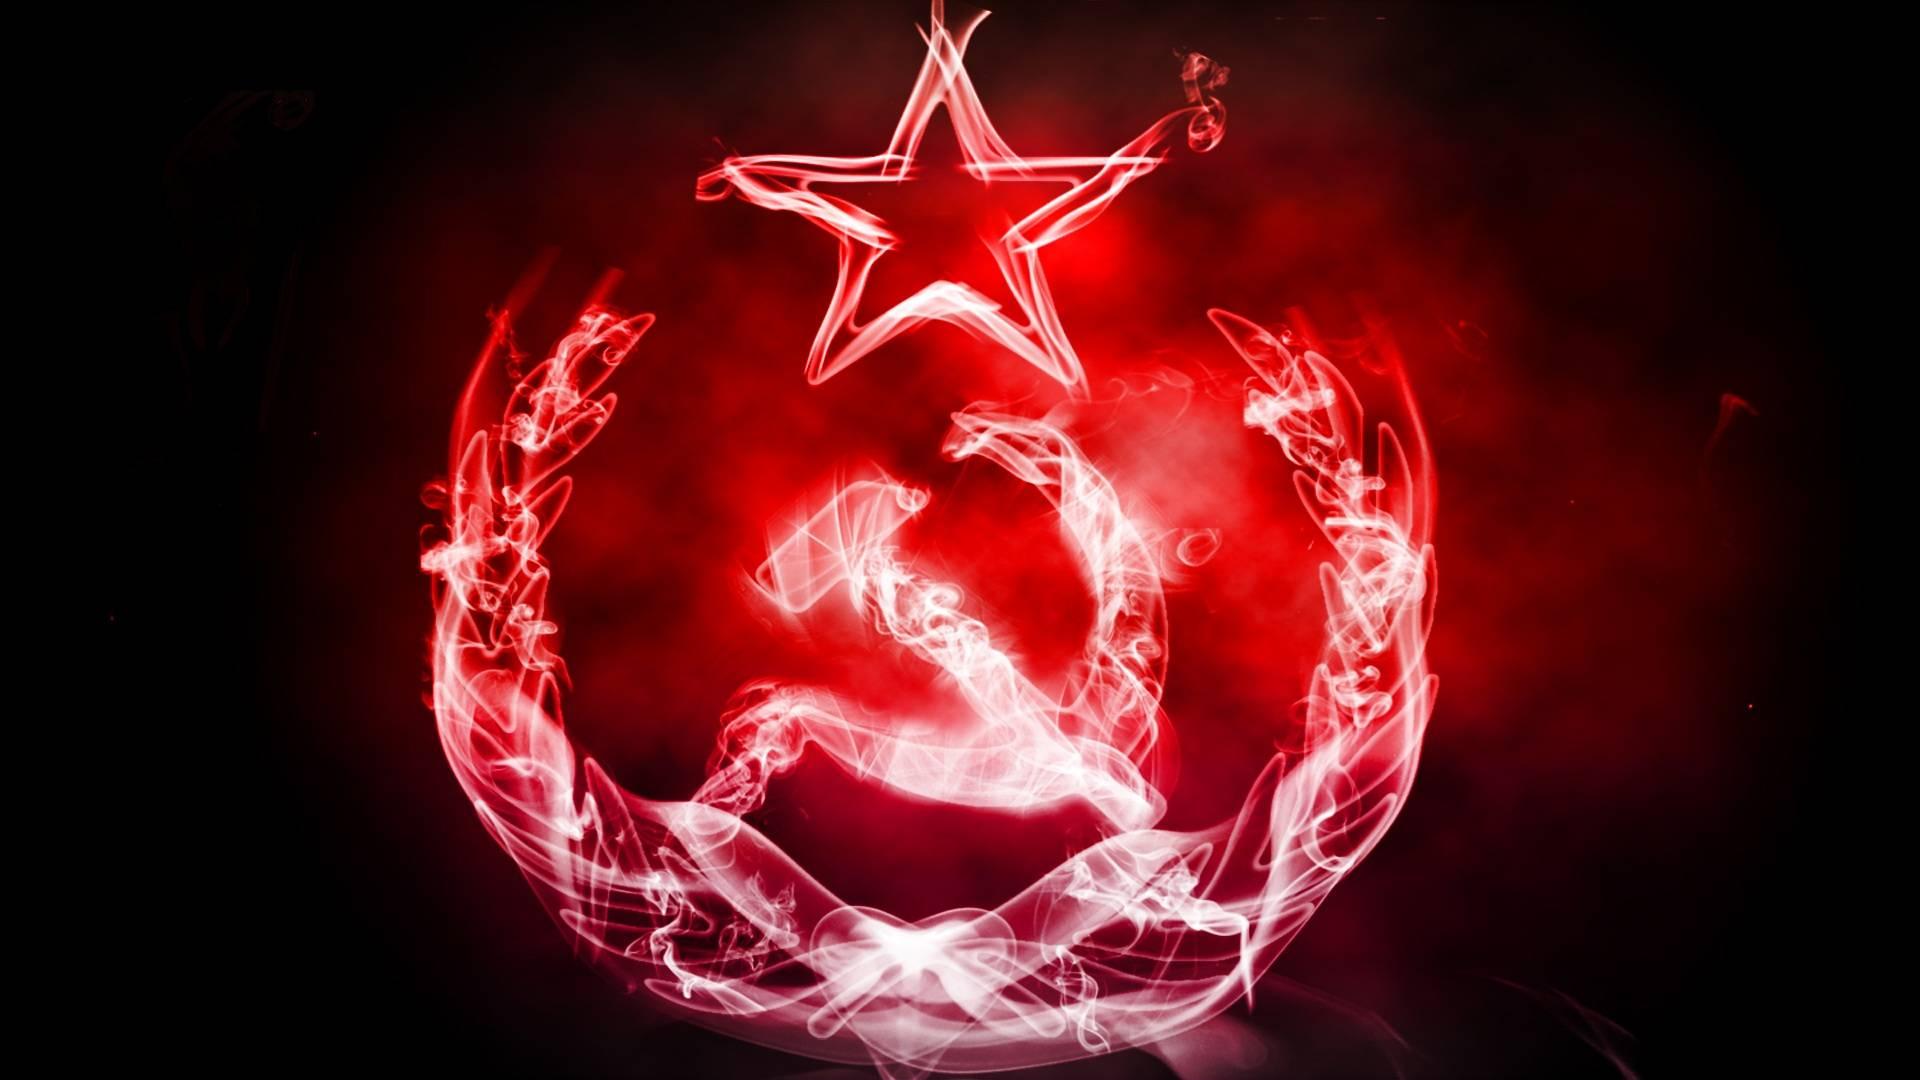 Communism Cccp wallpaperusorg 1920x1080